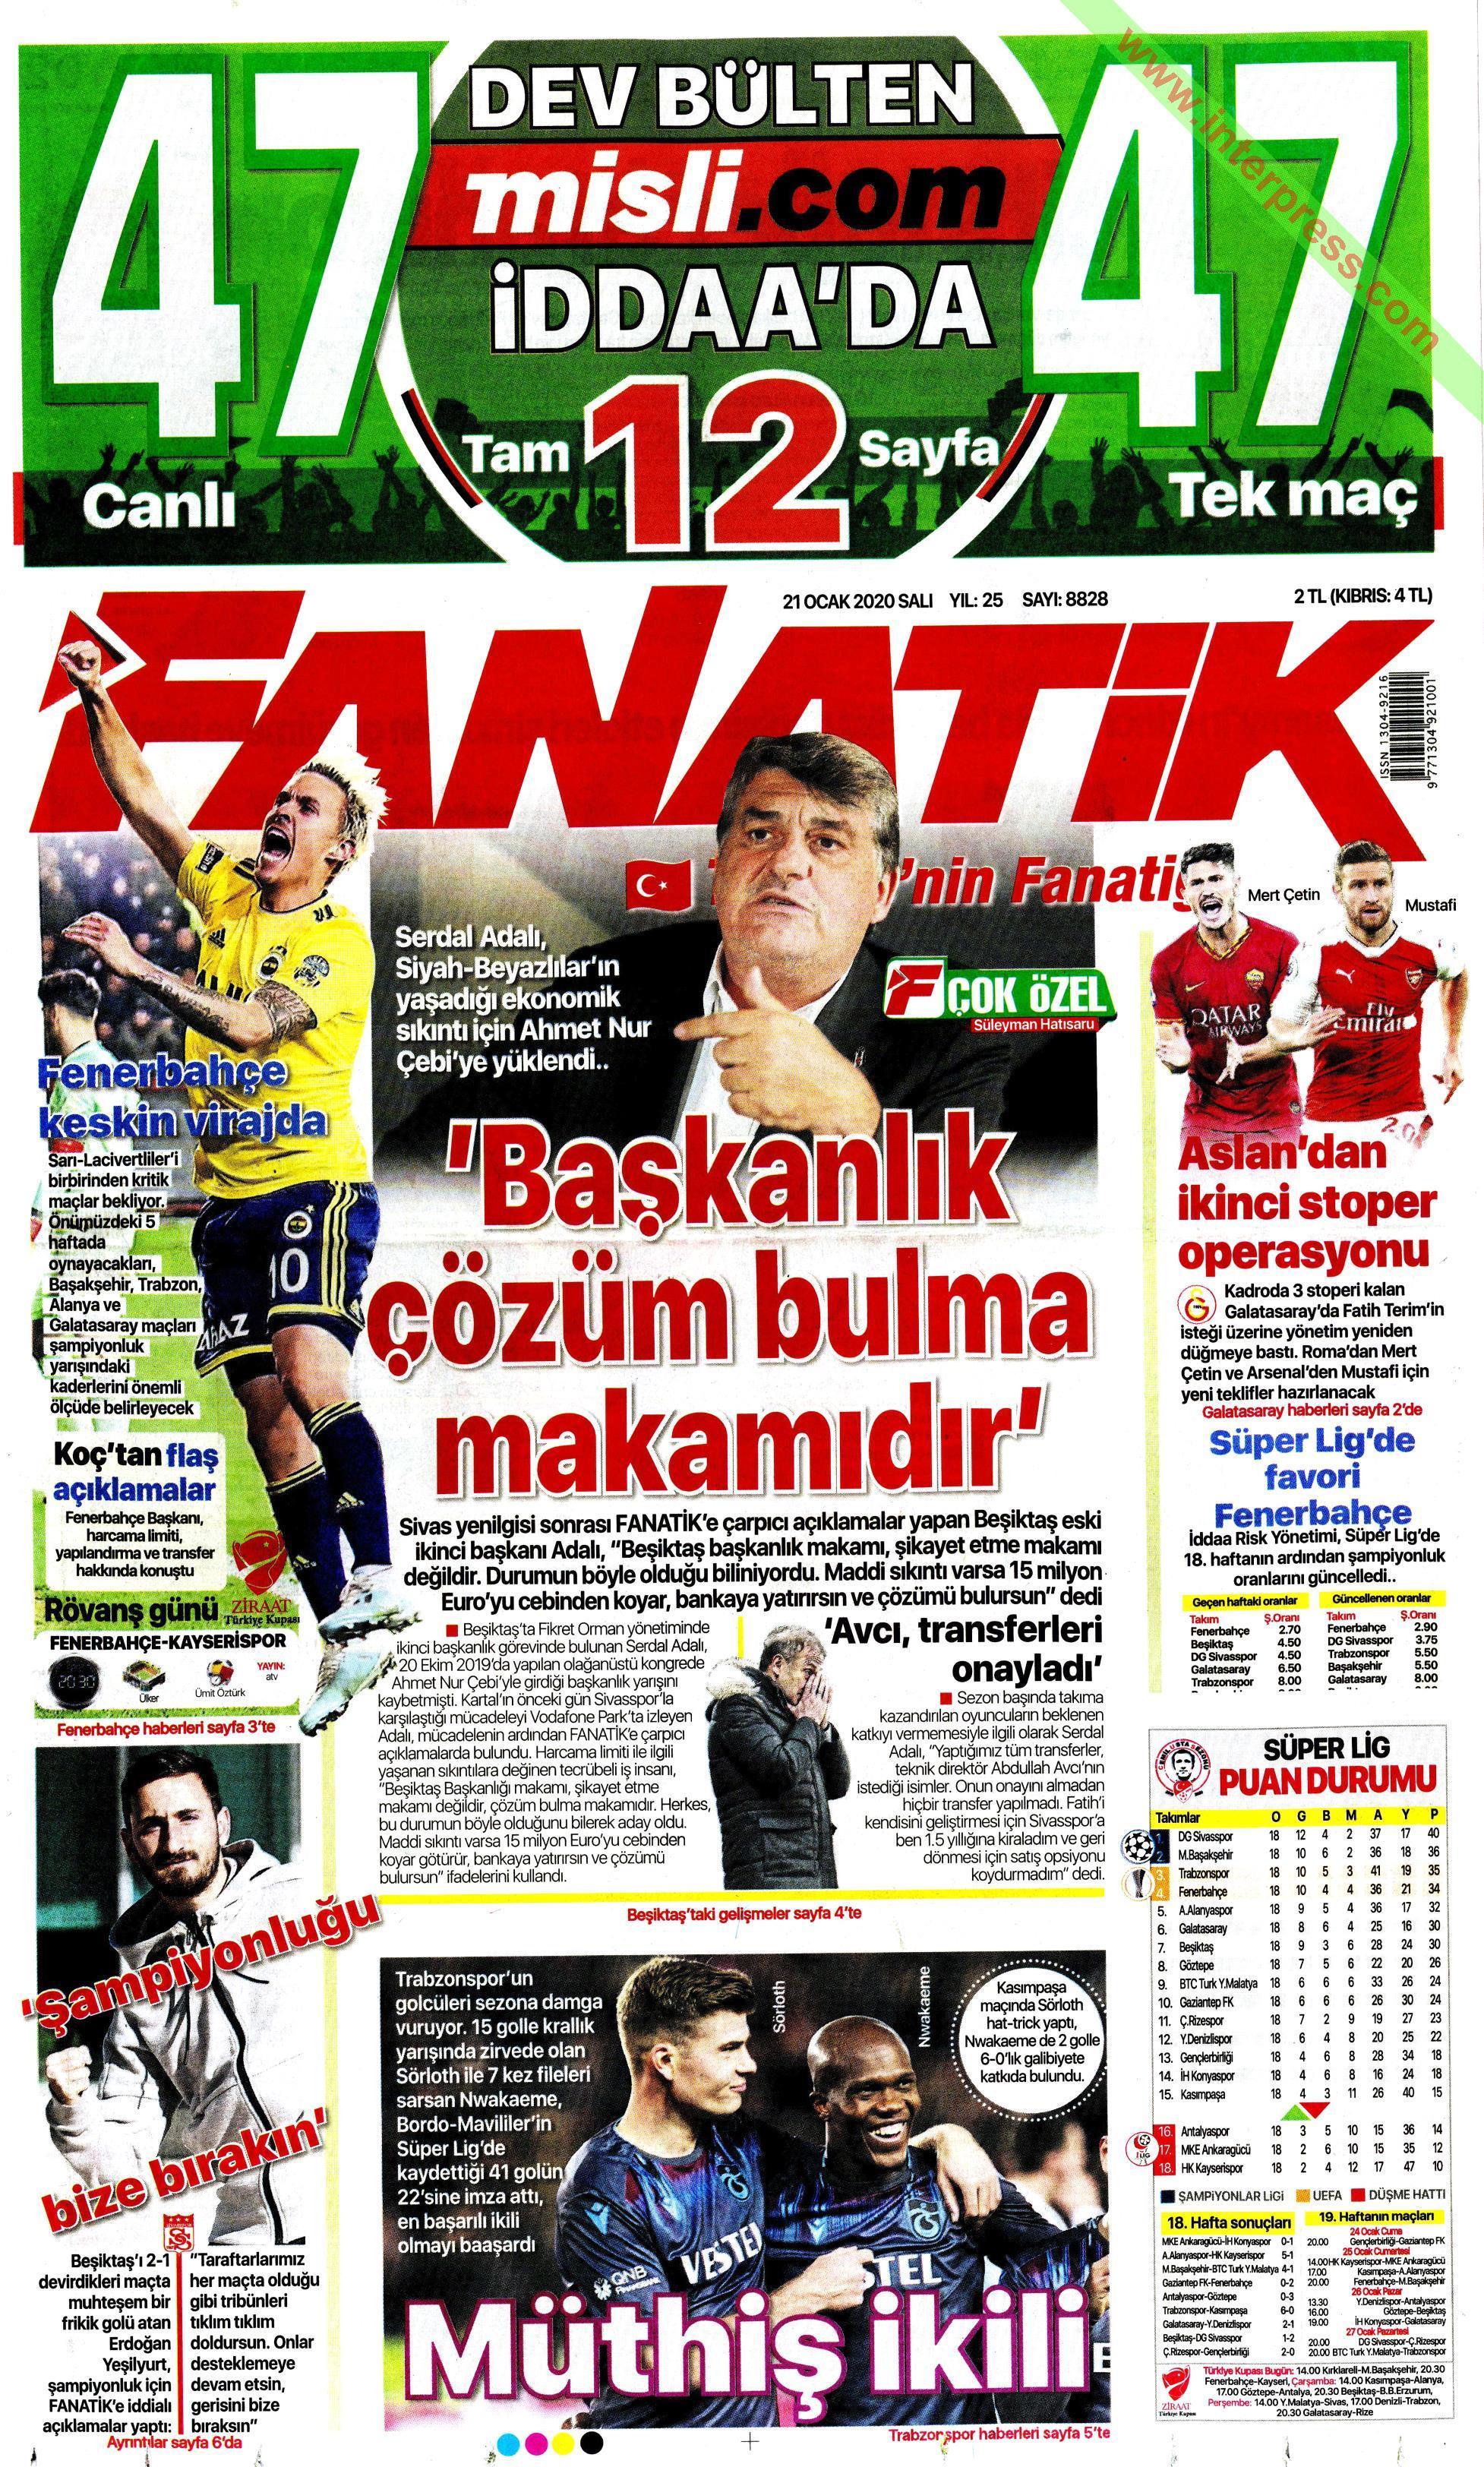 Fanatik gazetesi manşet ilk sayfa oku